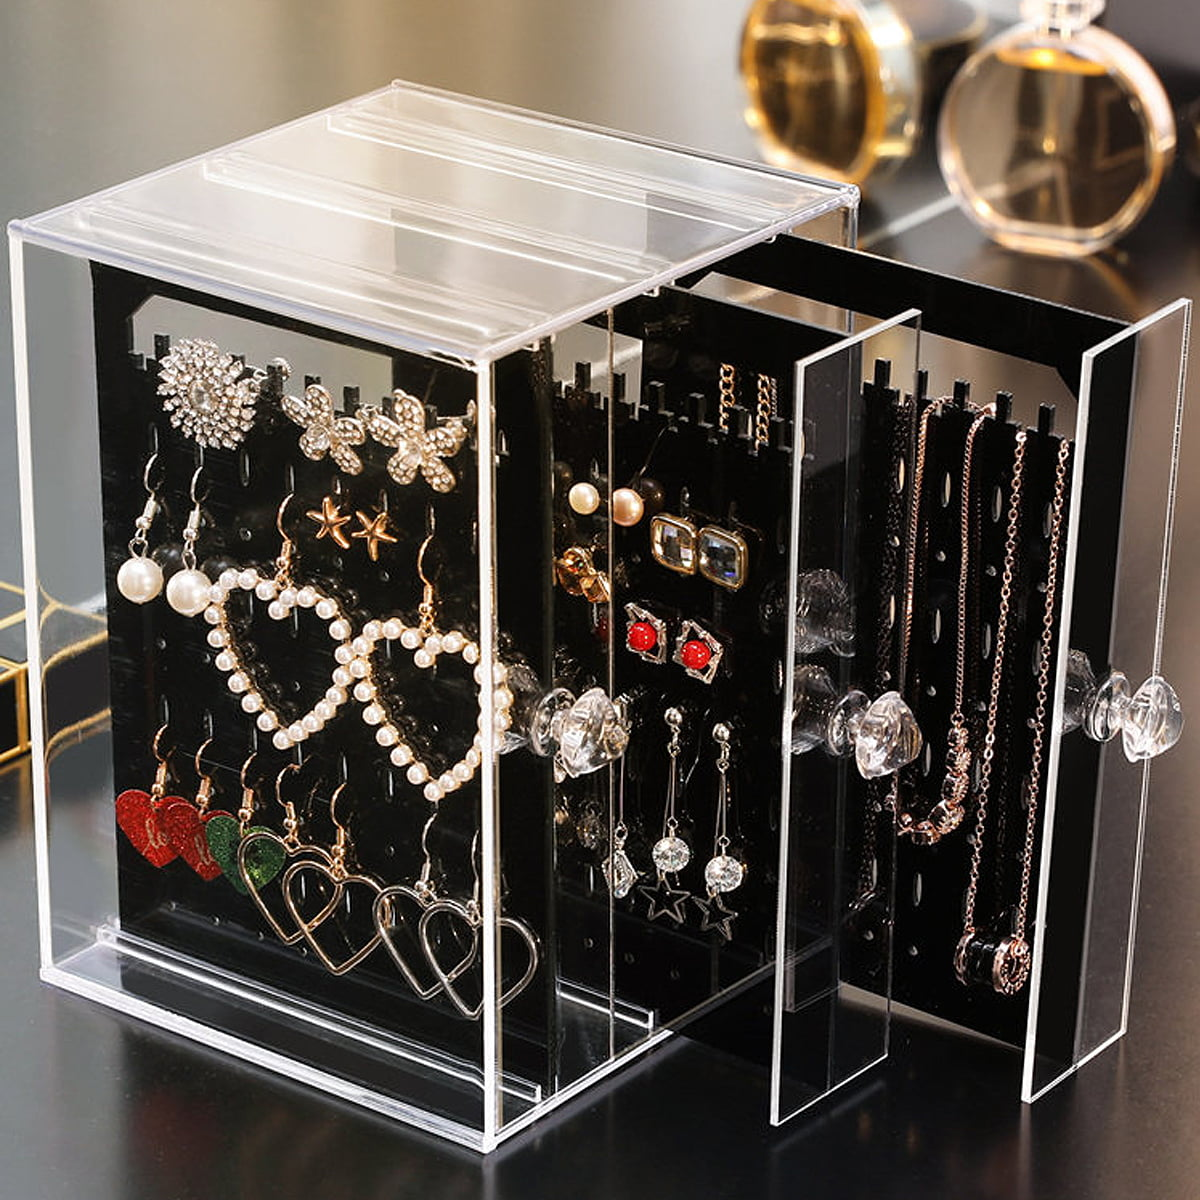 Acrylic Transparent Jewelry Boxes Organizers Earrings Display Stand Storage Box Drawers Design Earrings Jewelry Organizer For Home Living Room Bedroom Walmart Com Walmart Com